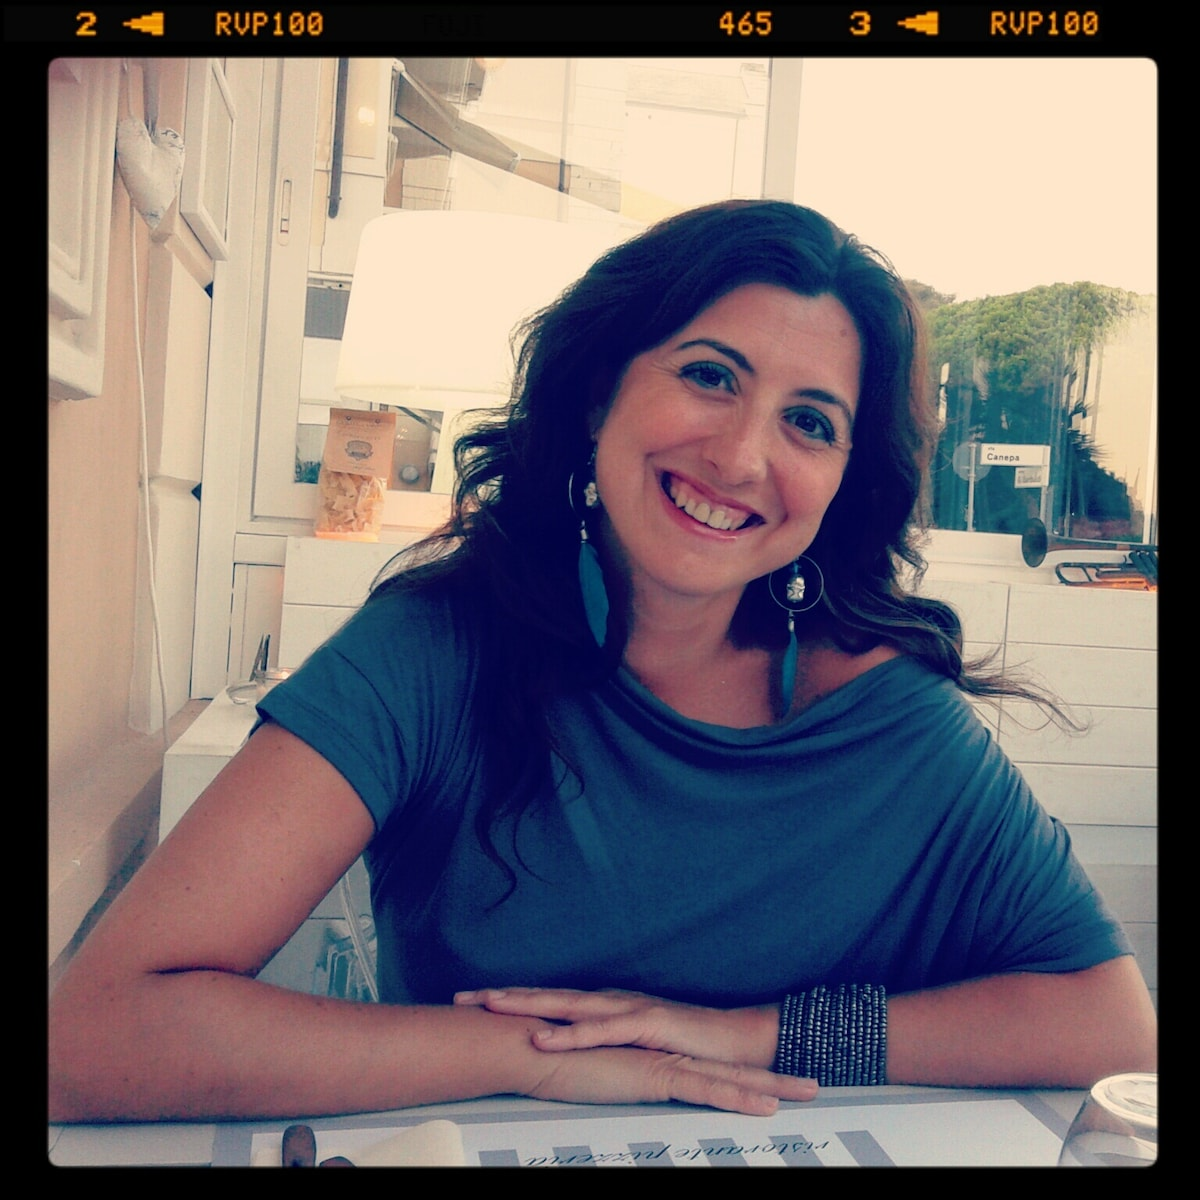 Sarah from Roseto degli Abruzzi